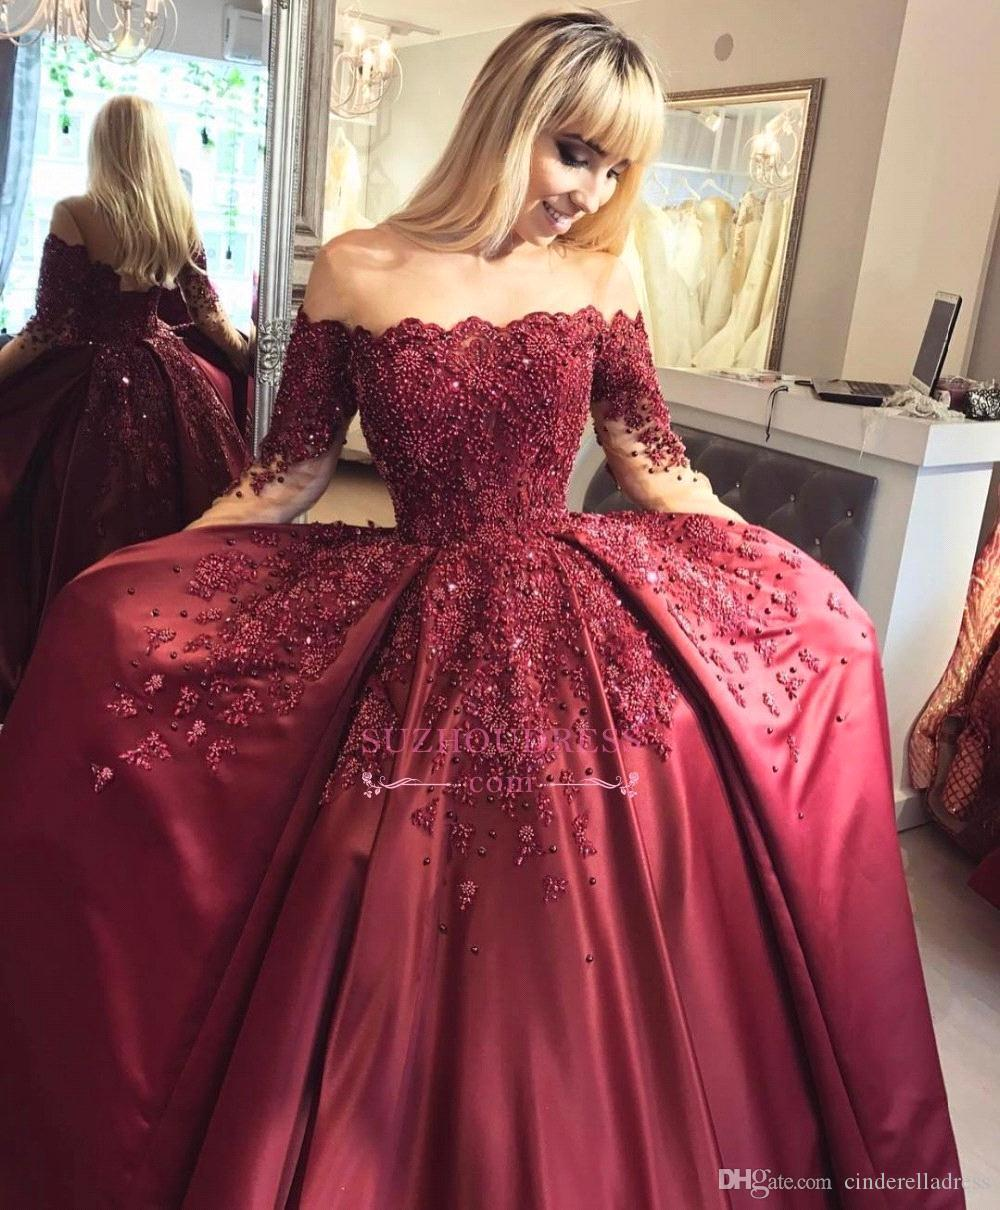 2018 Vermelho Escuro Off The Shoulder vestido de Baile Quinceanera Vestidos Floral Doce 16 Mangas Compridas Applique Pérolas Beads Vestidos de Noite BA6695